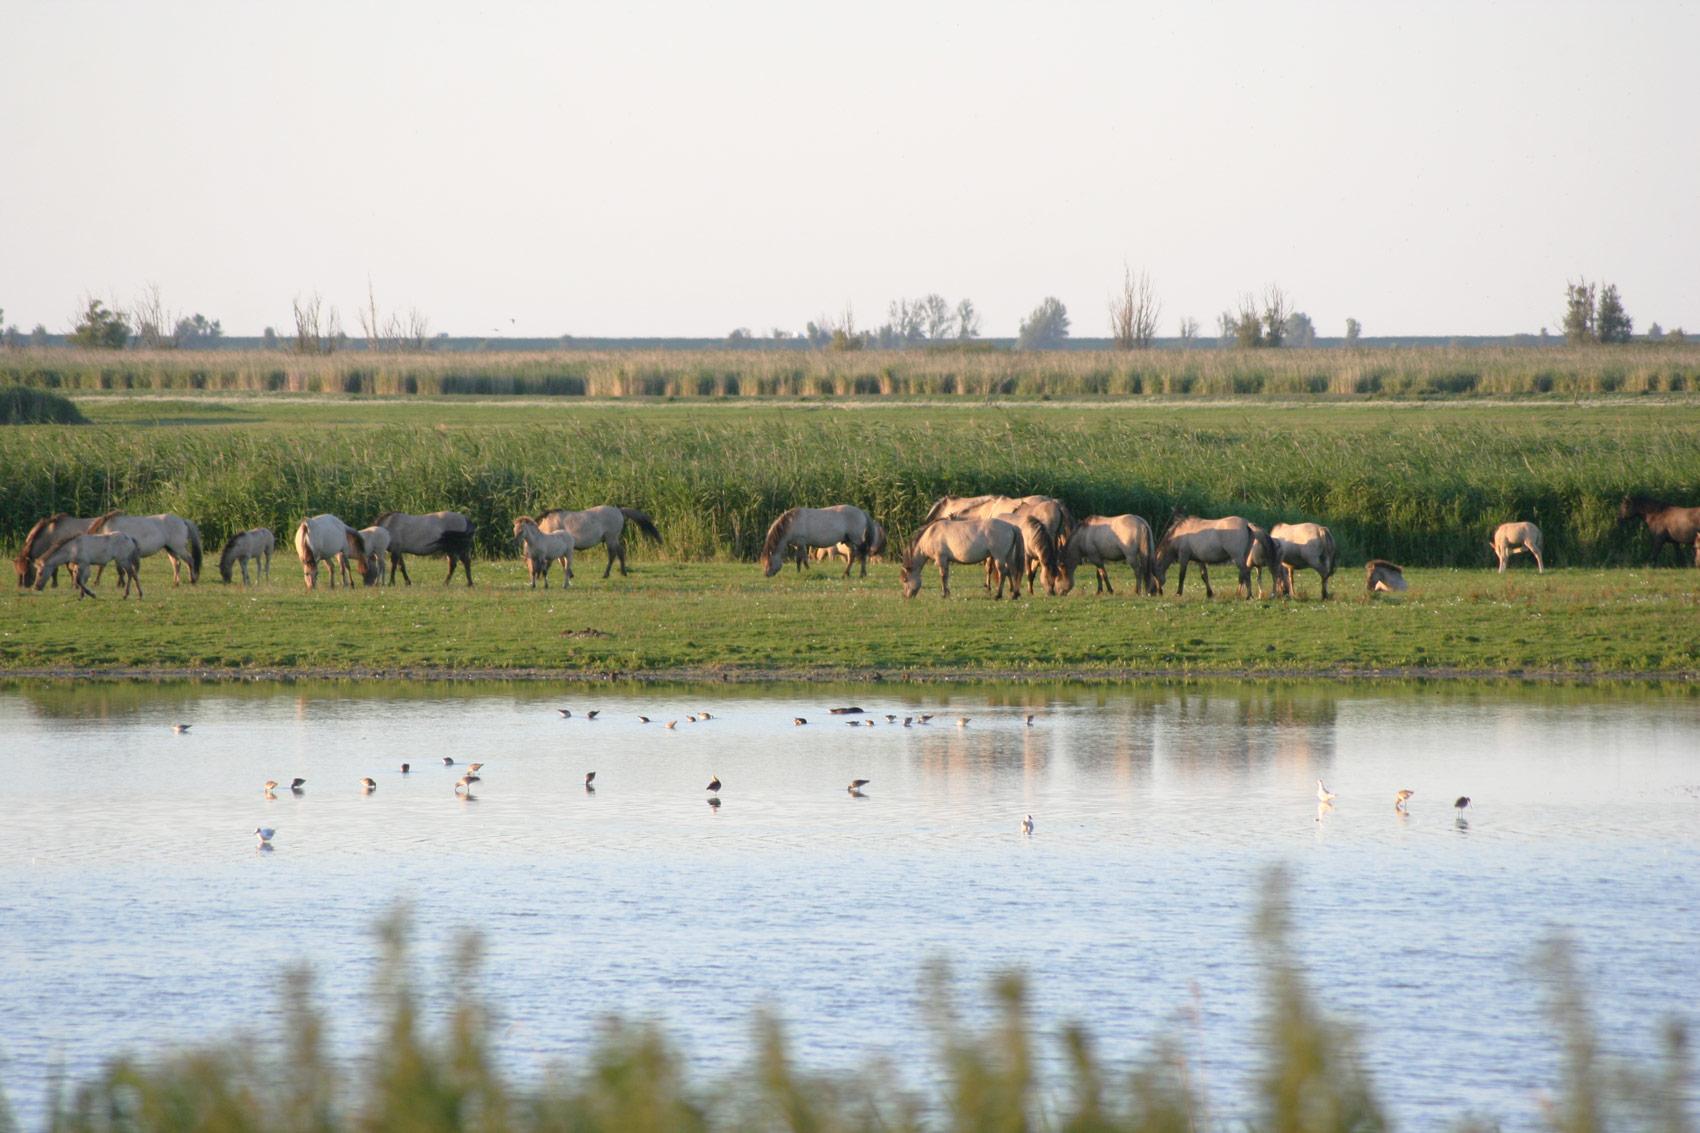 Rewilding London Walthamstow Wetlands